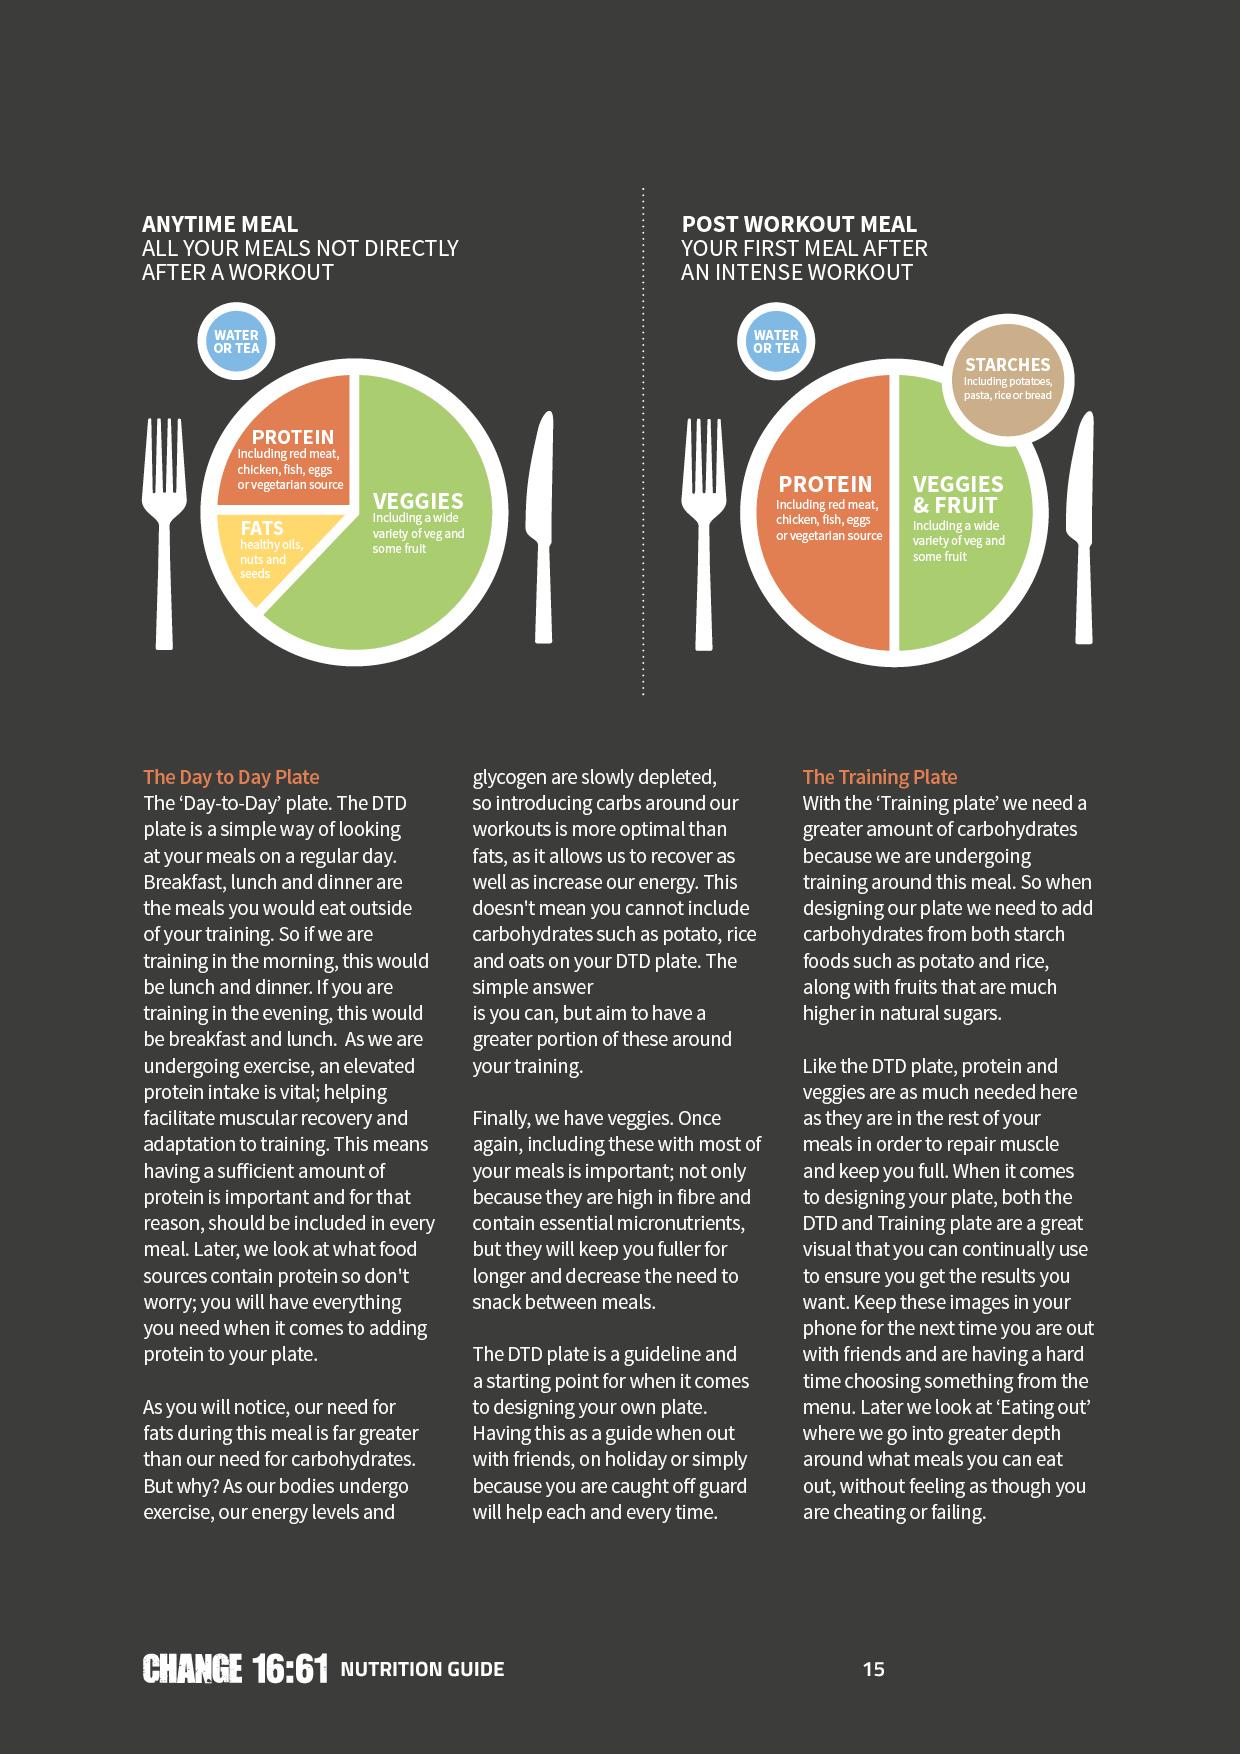 Change 16-61 Nutrition Guide4.jpg